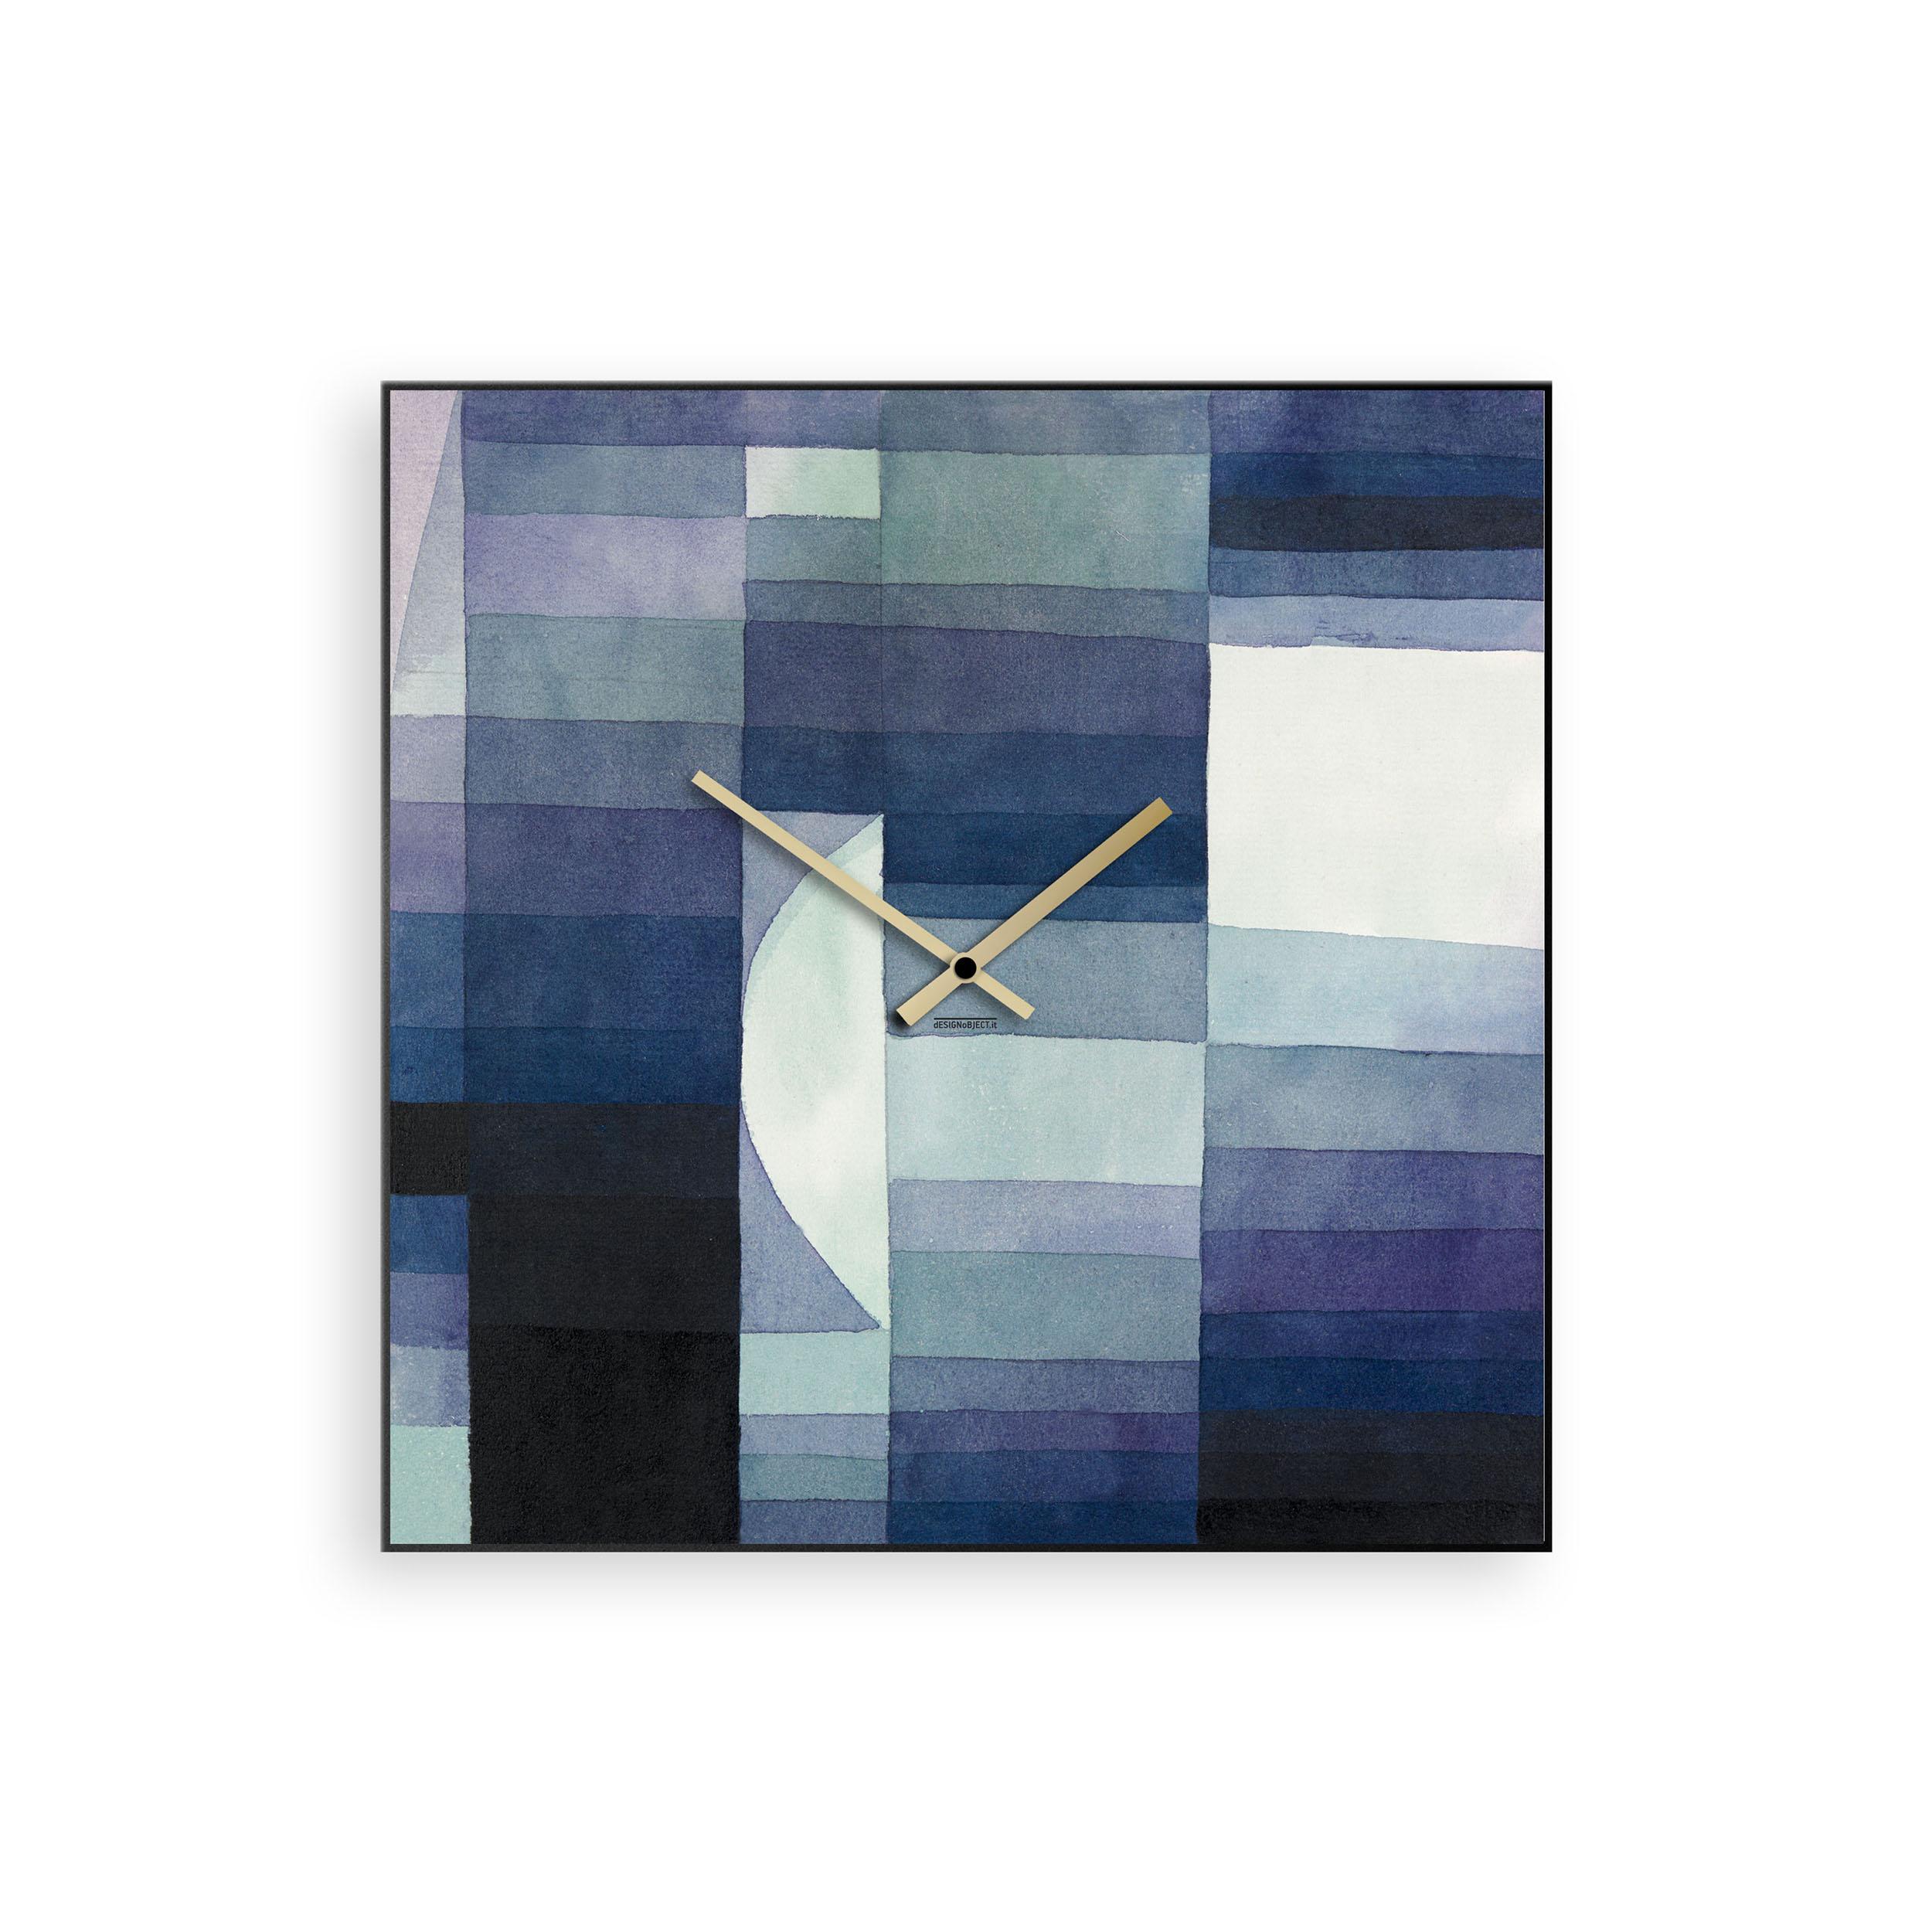 Orologio Lancette Dorate